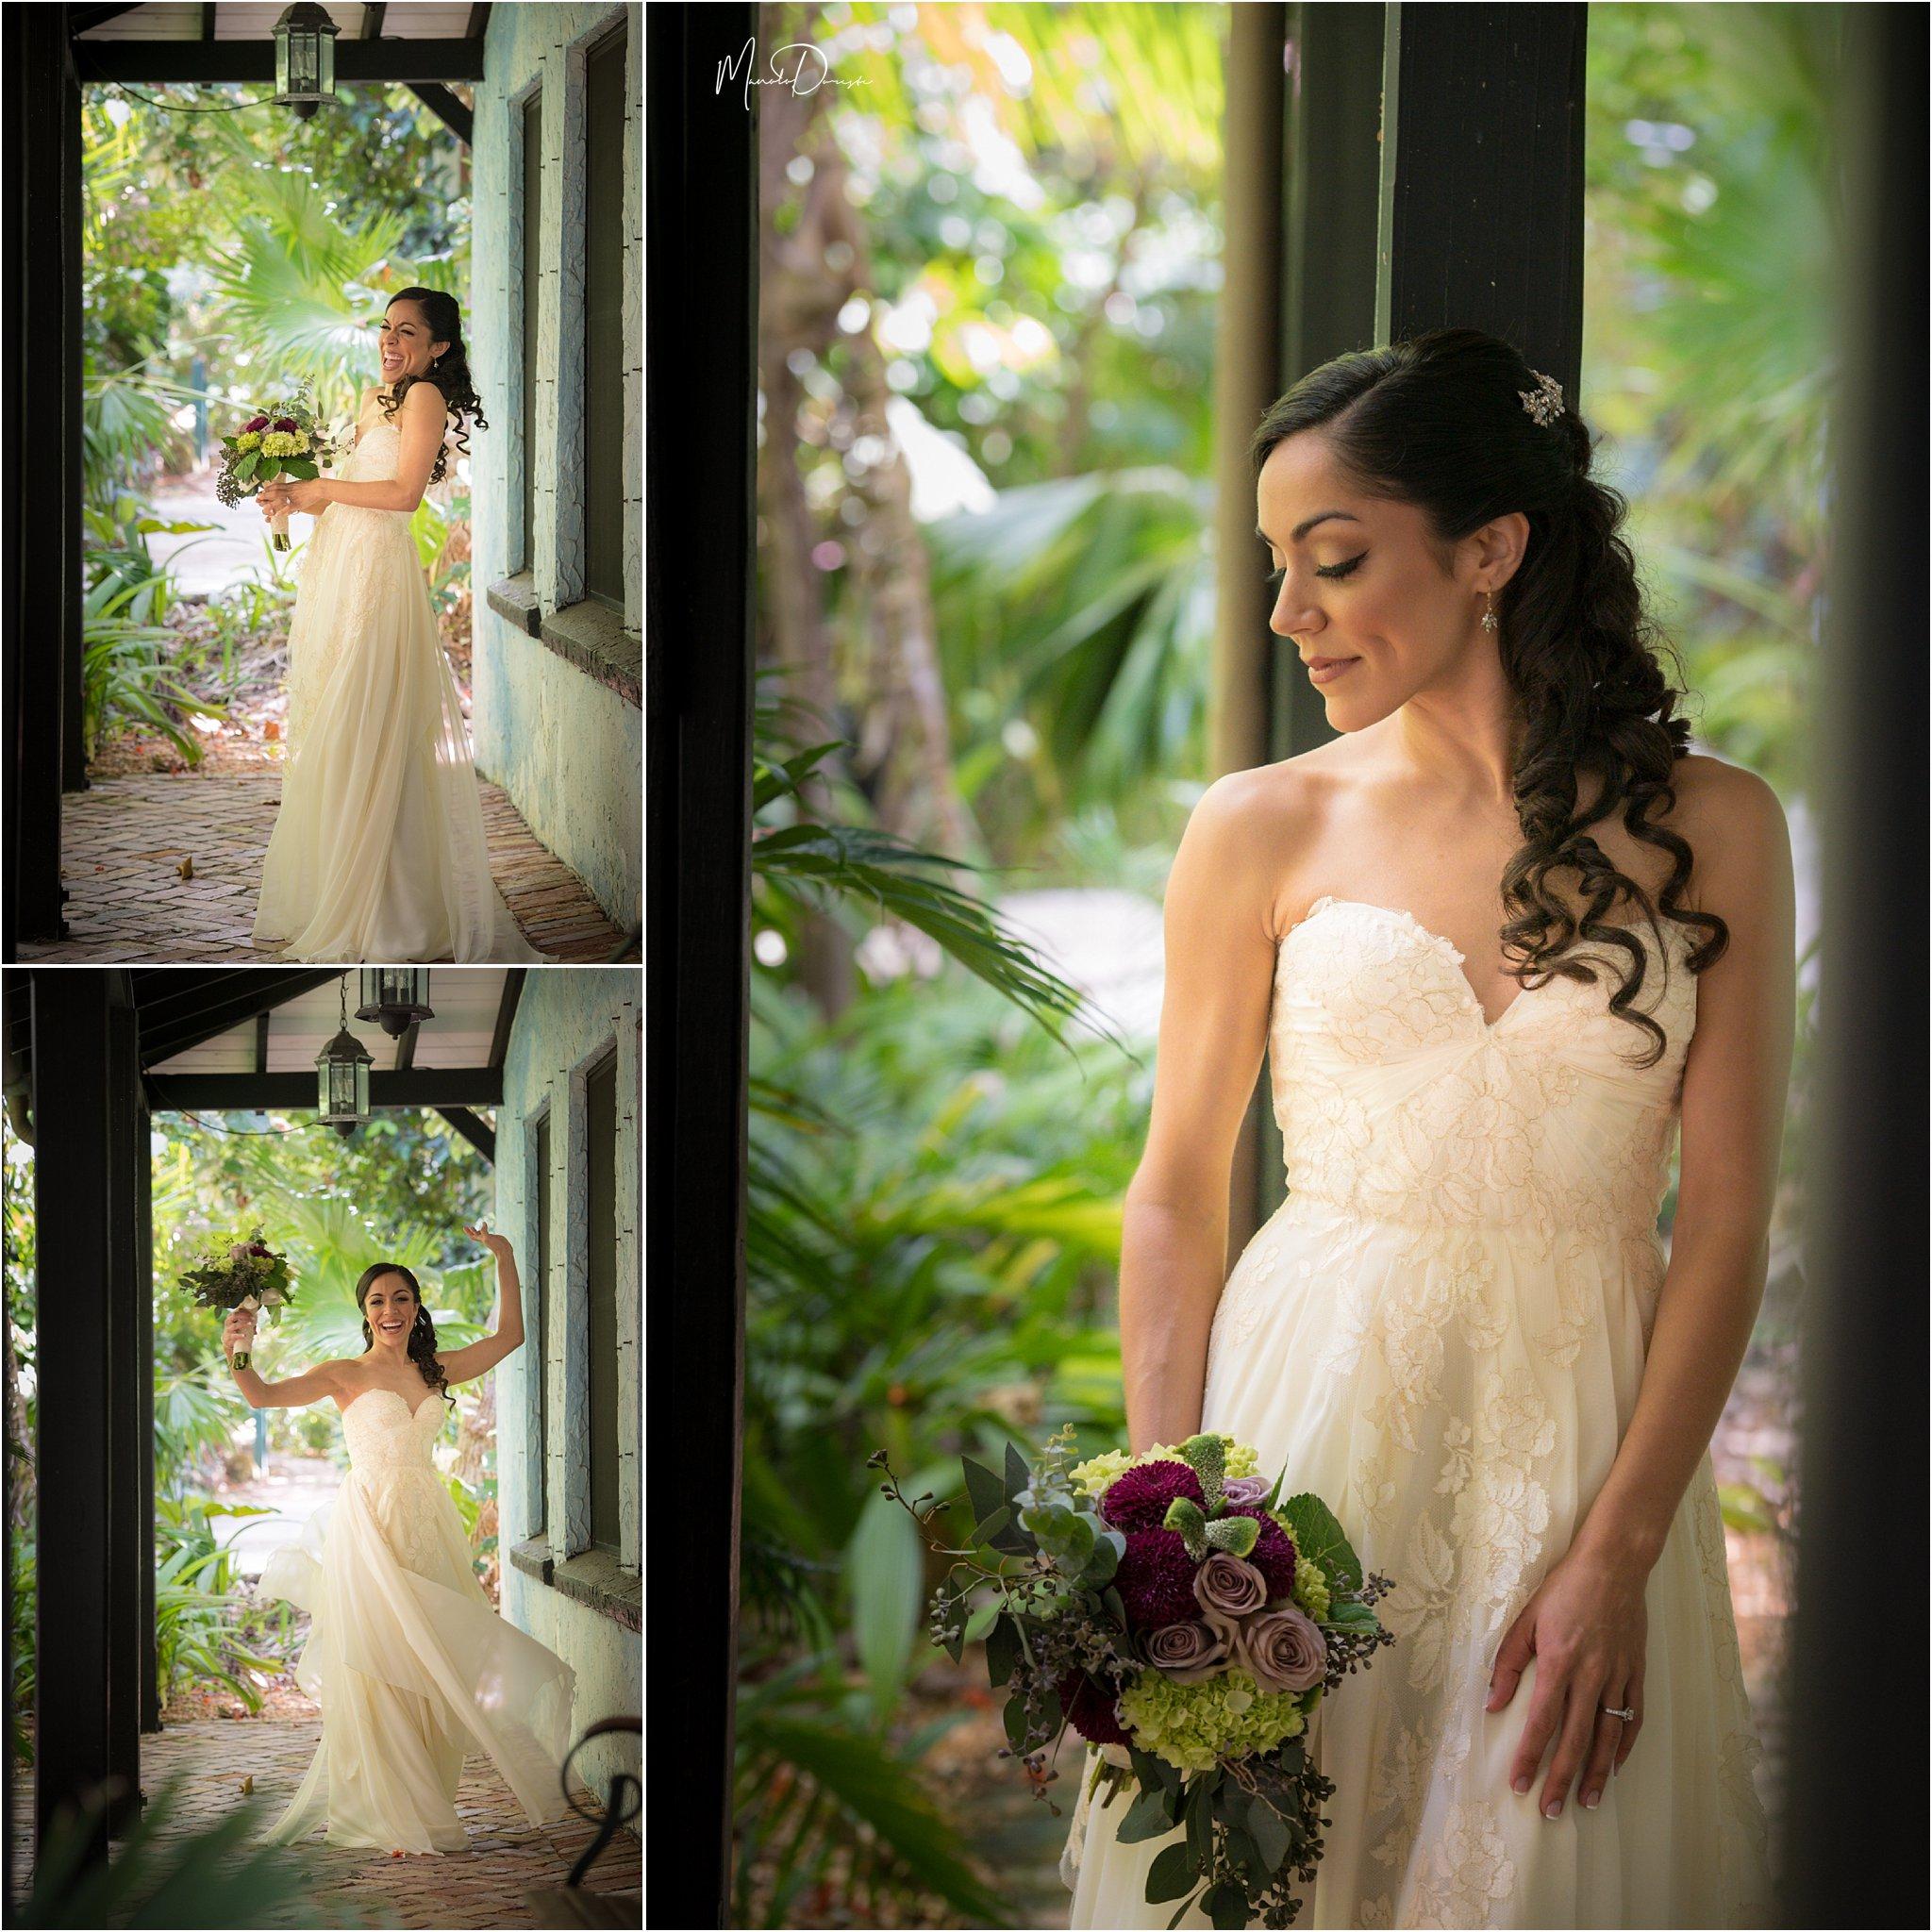 0500_ManoloDoreste_InFocusStudios_Wedding_Family_Photography_Miami_MiamiPhotographer.jpg